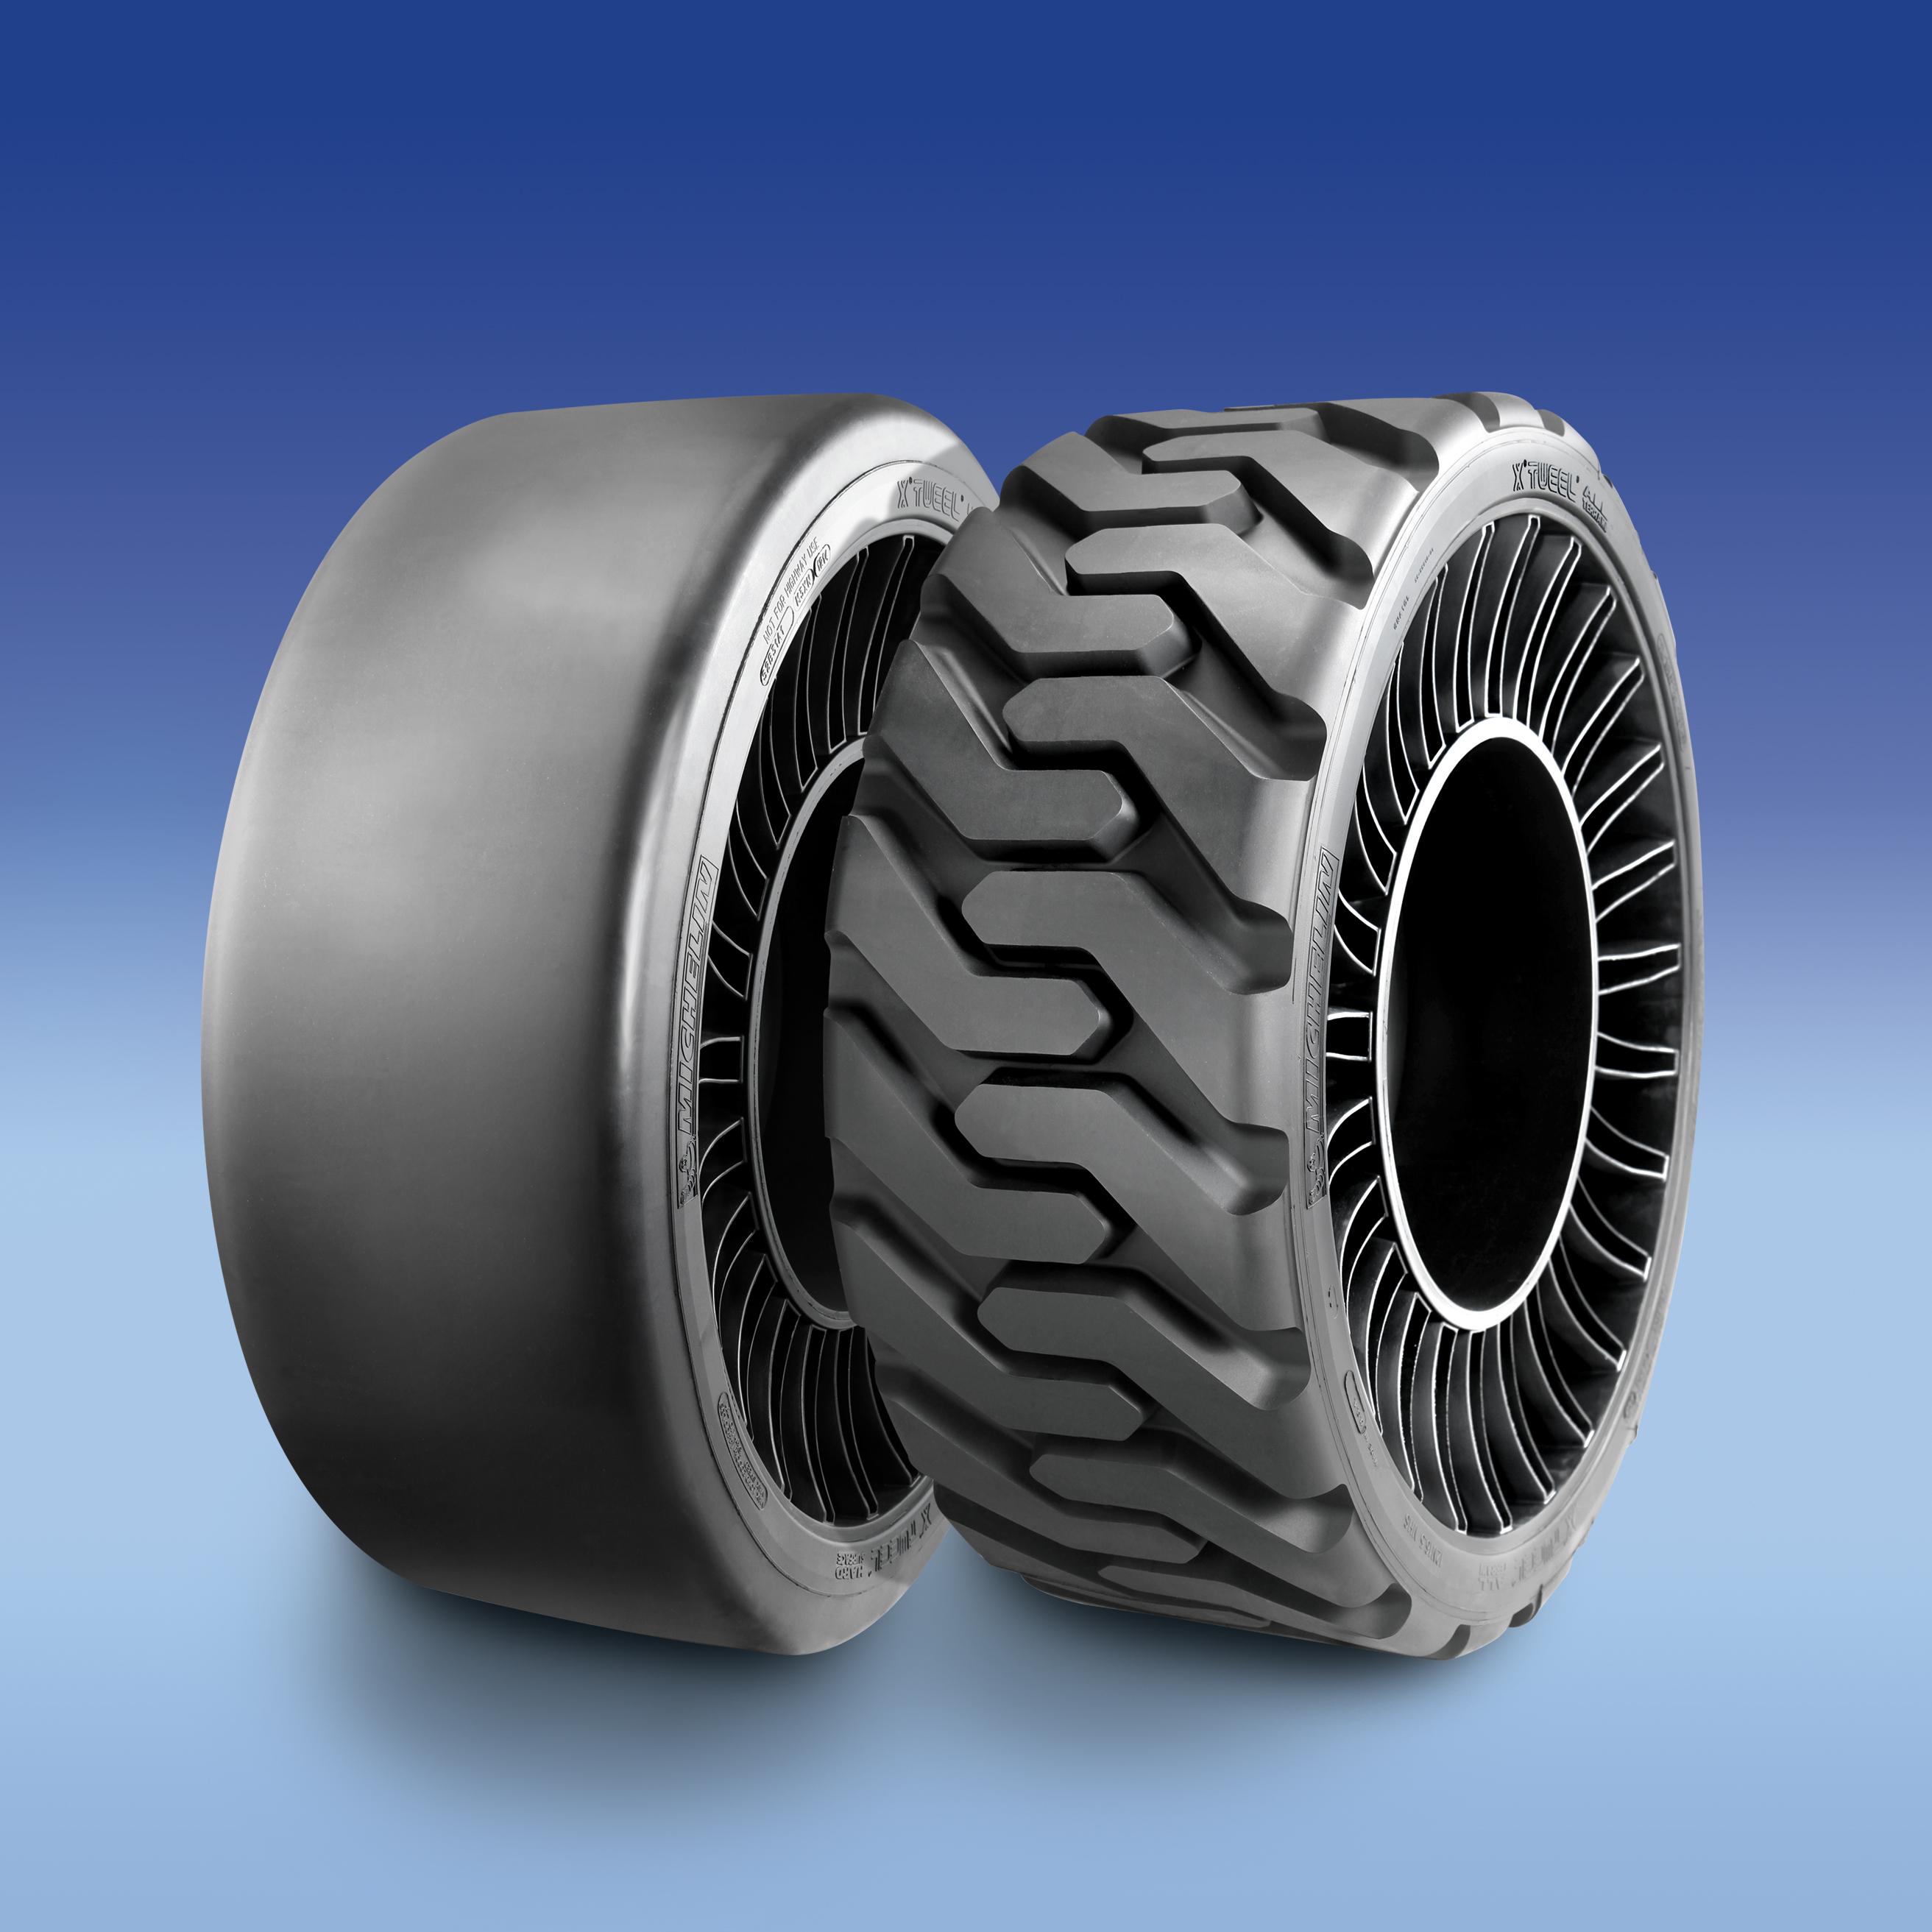 Michelin Developing Airless Tire/Wheel Called 'Tweel'